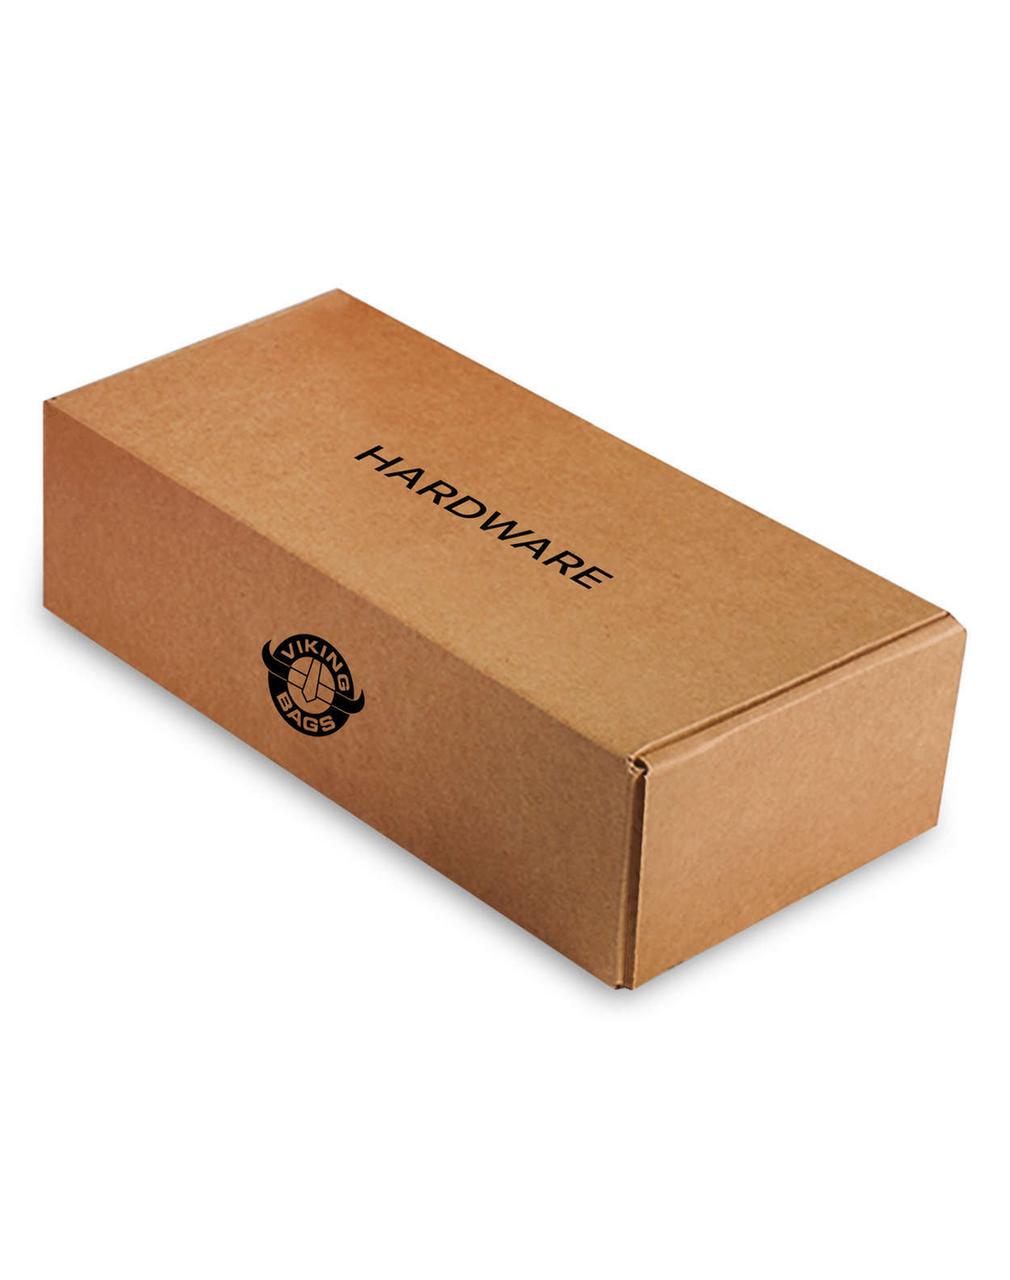 Honda Magna 750 SS Side Pocket Studded Motorcycle Saddlebags box